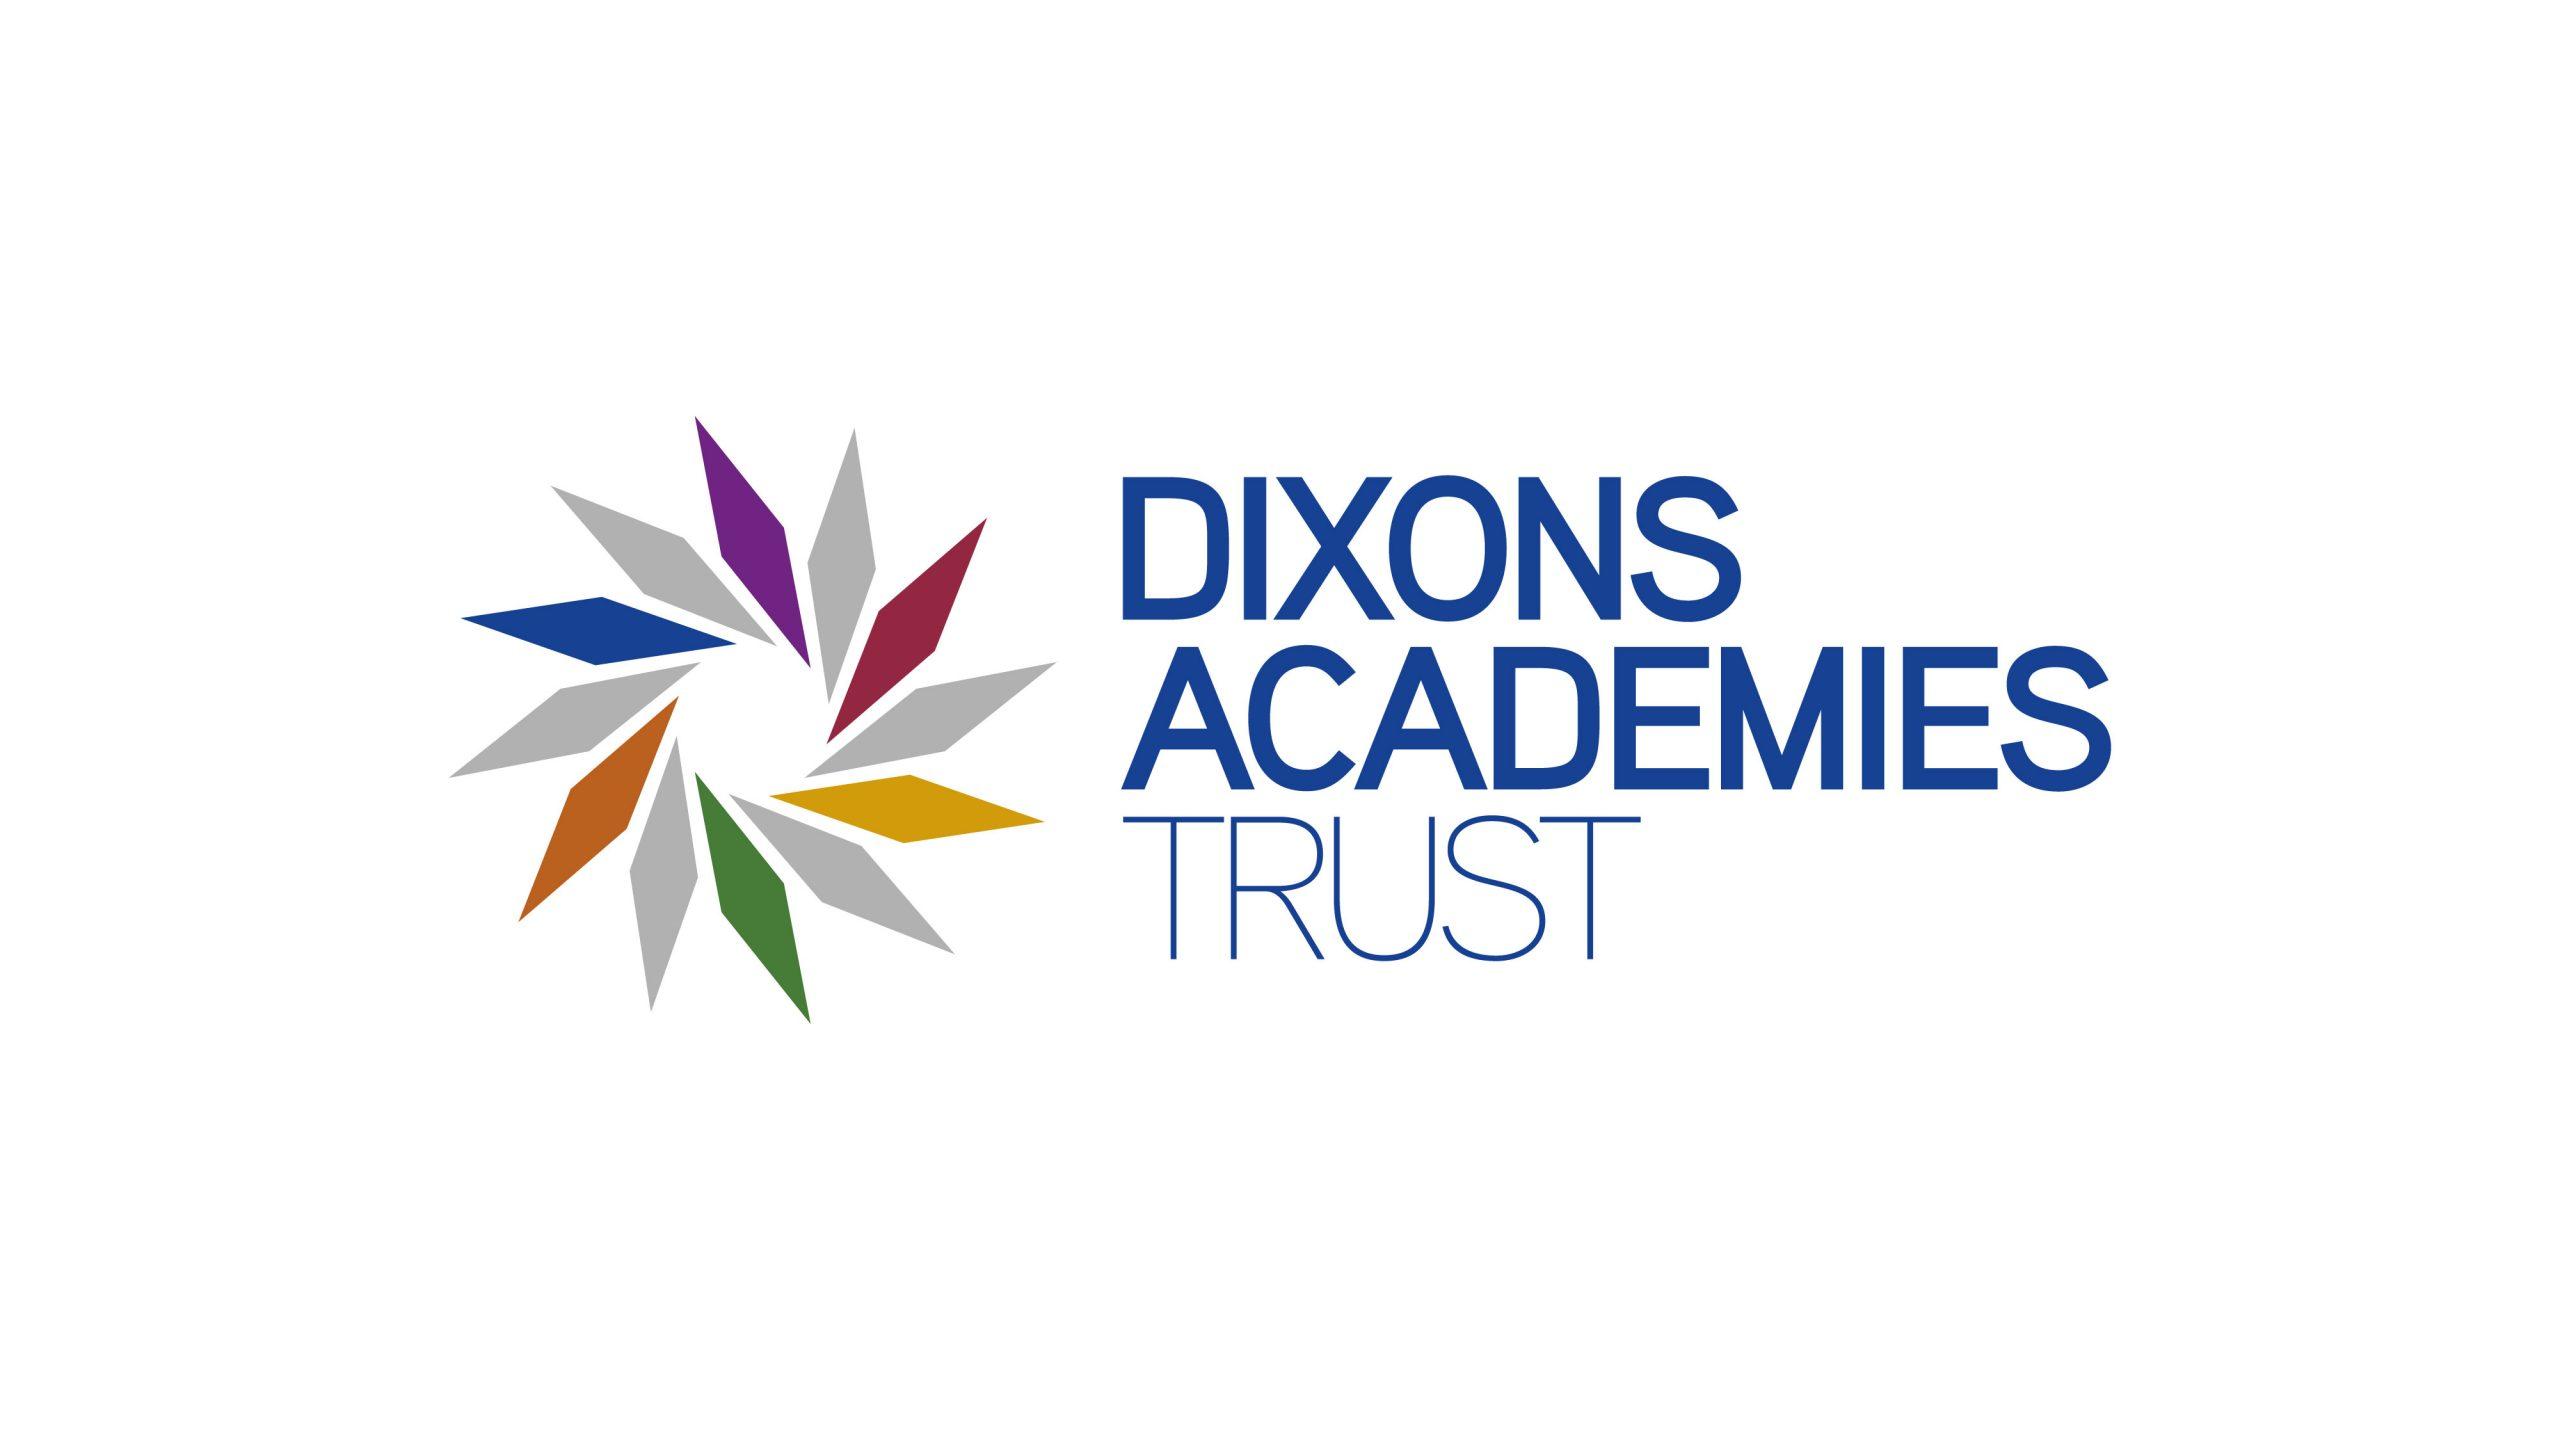 dixons_academy_08